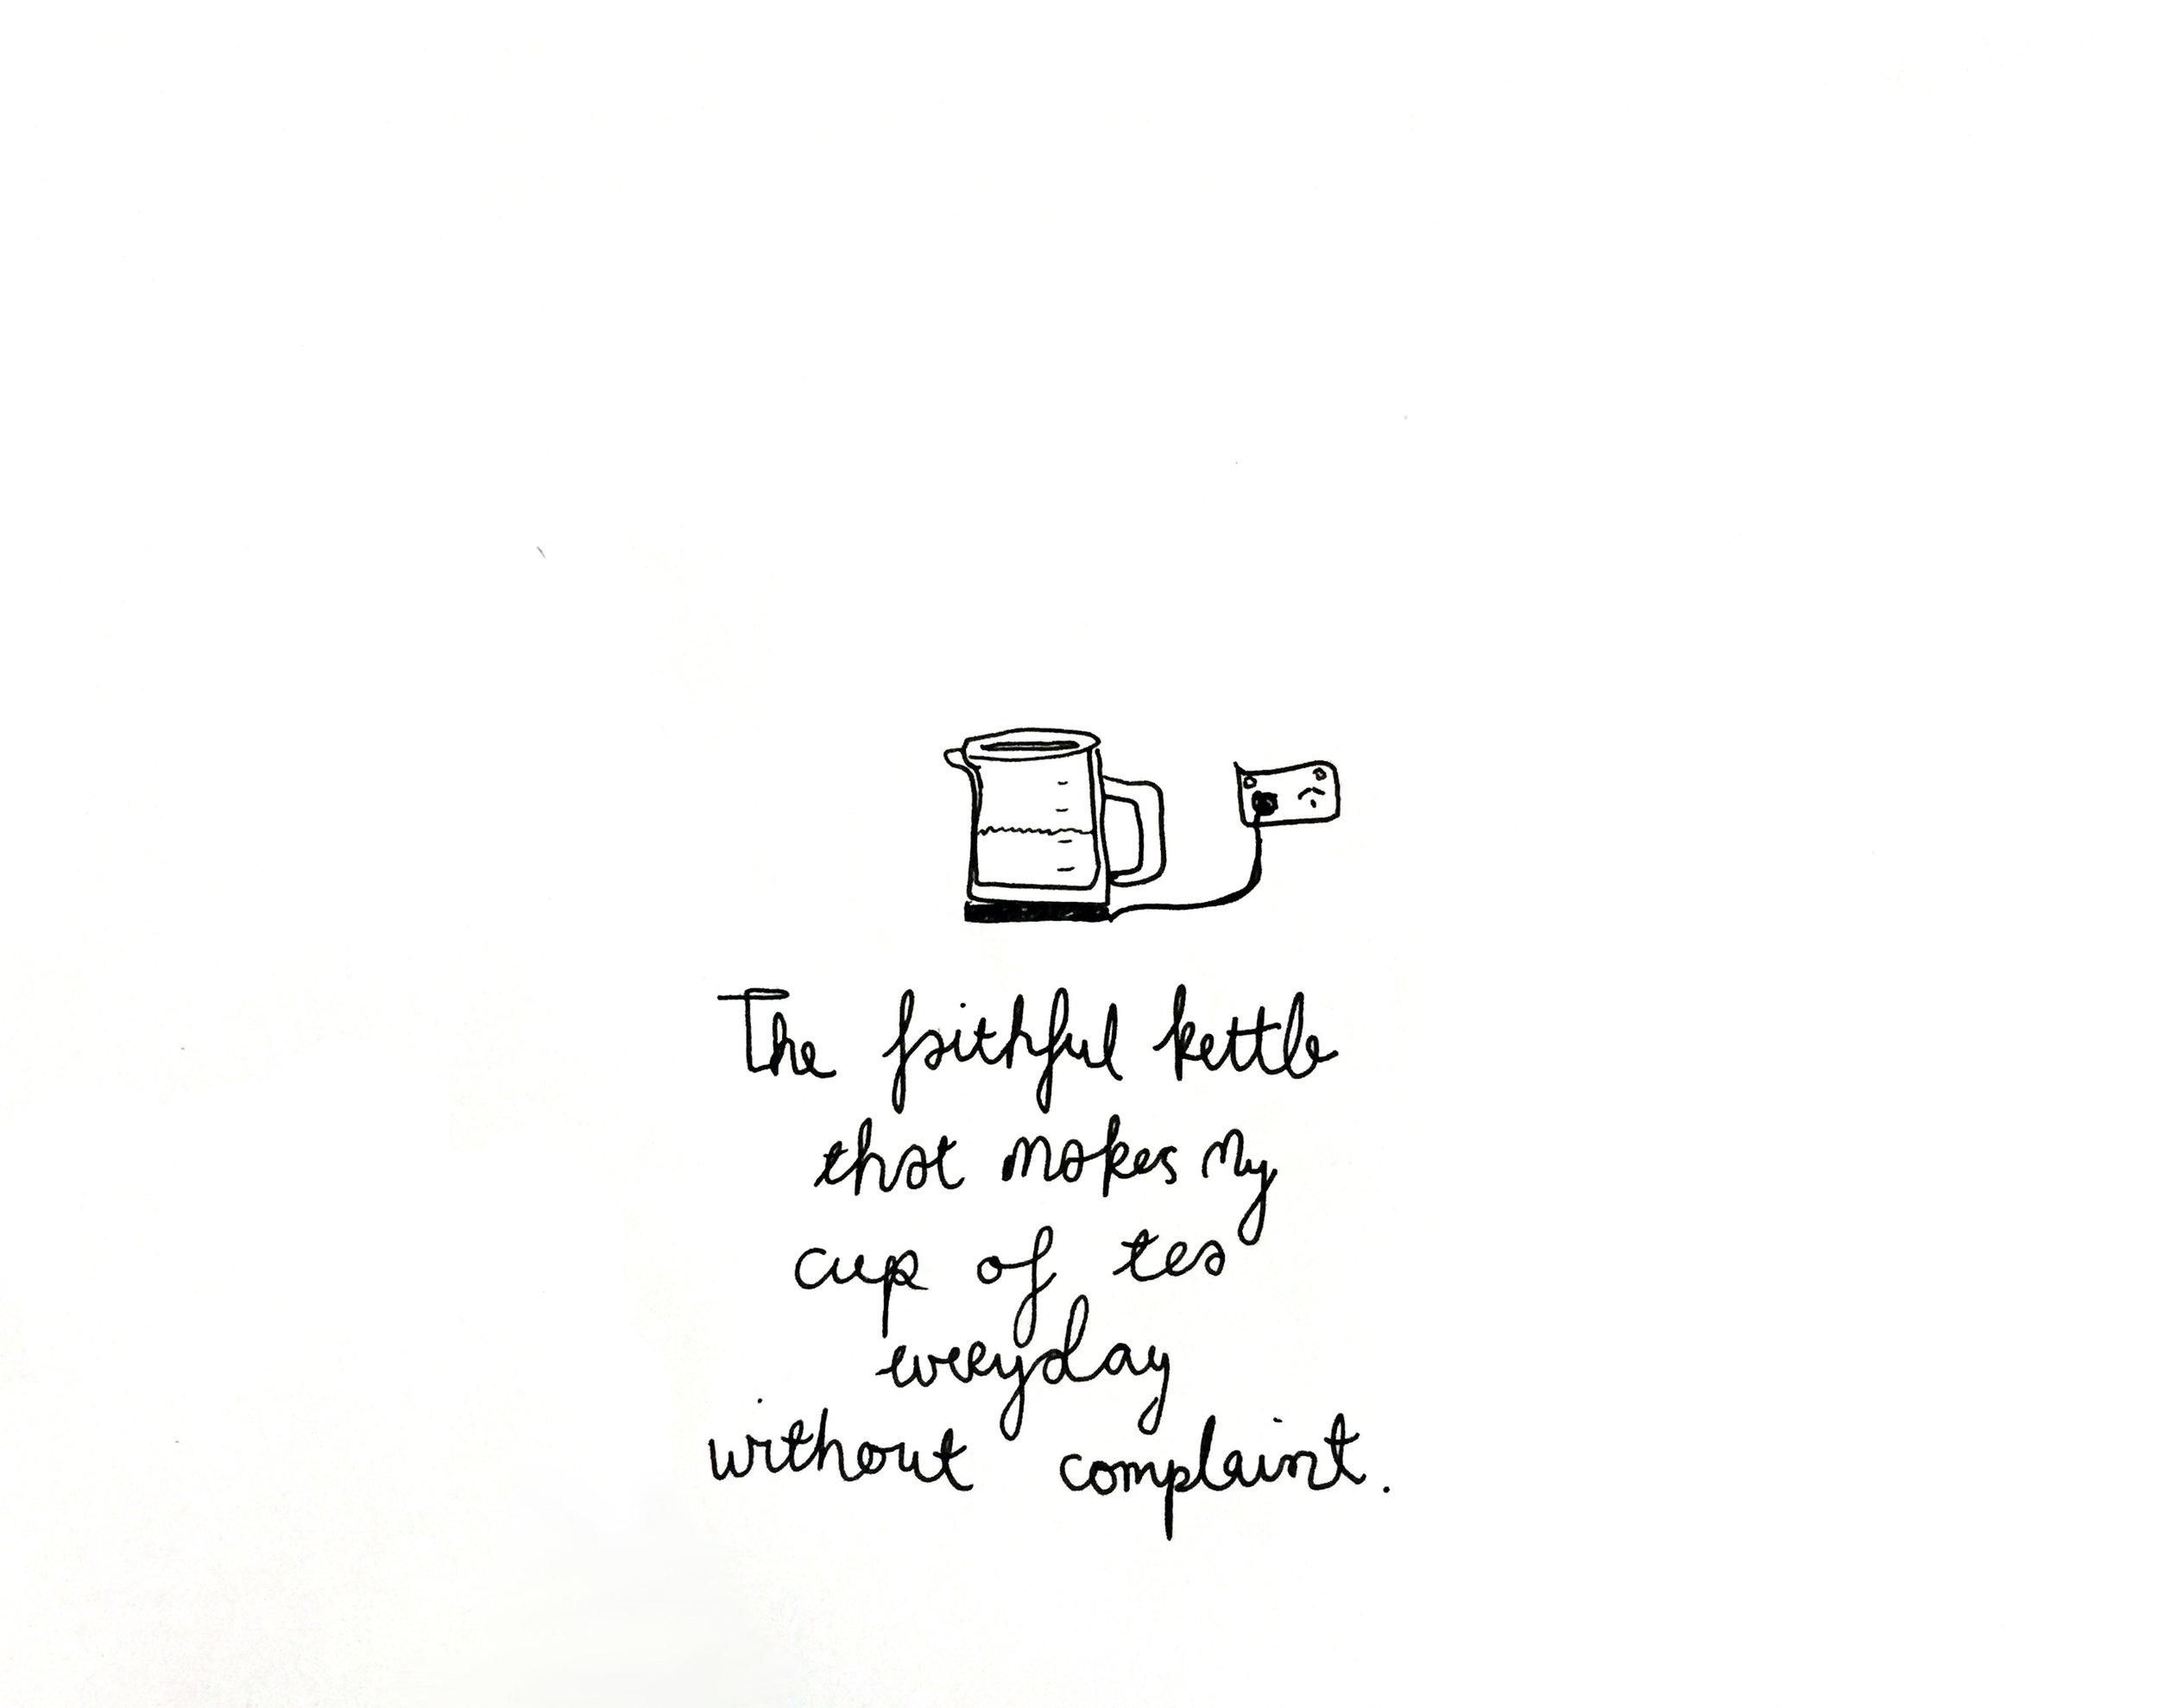 The faithful kettle. Drawing Luke Hockley.